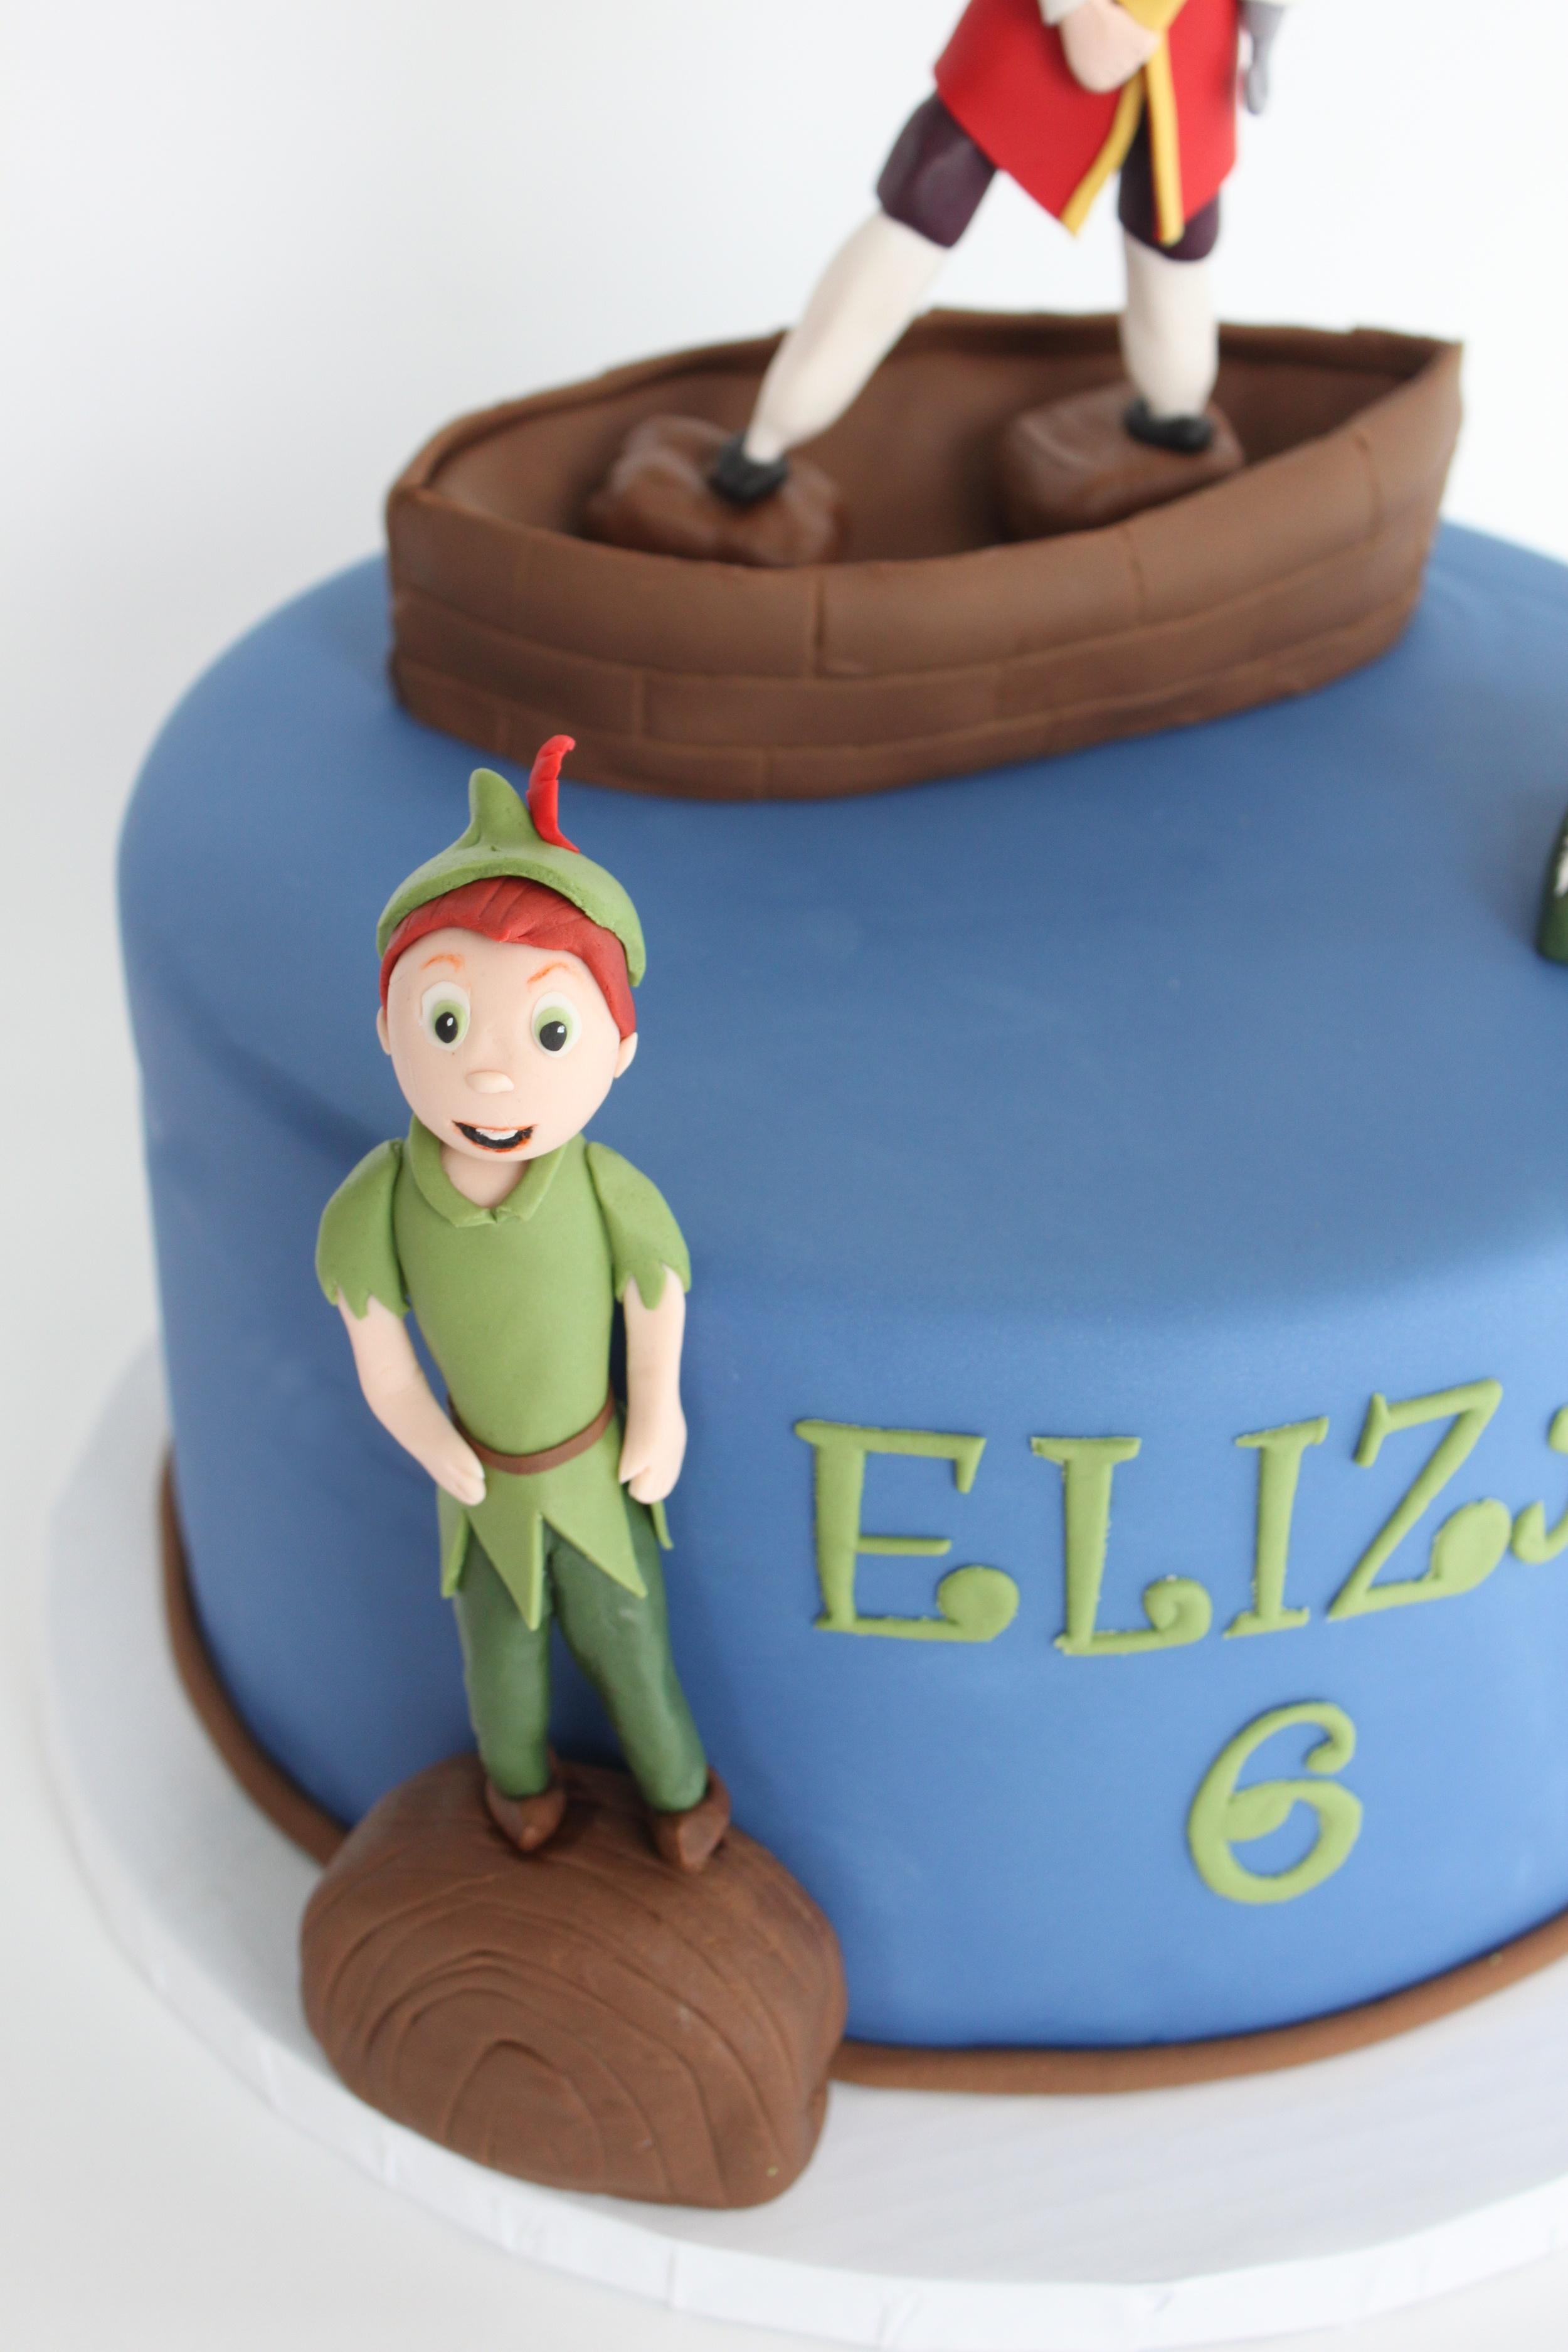 Peter Pan cake topper 8591.jpg